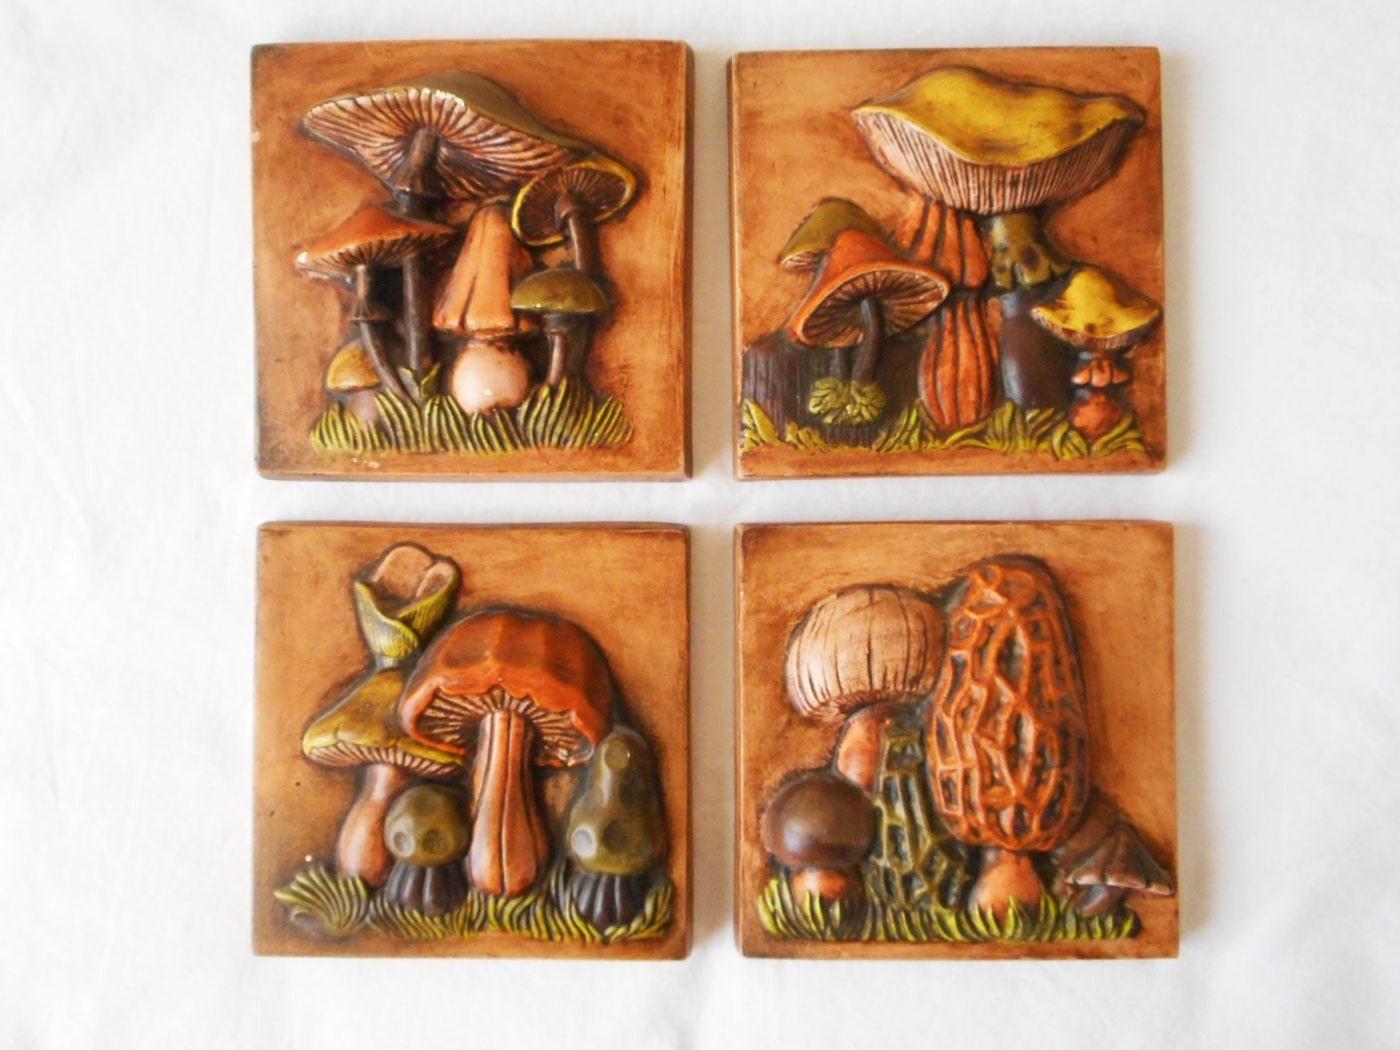 1970s Botanical Mushrooms Wall Decor Ceramic Plaques 5